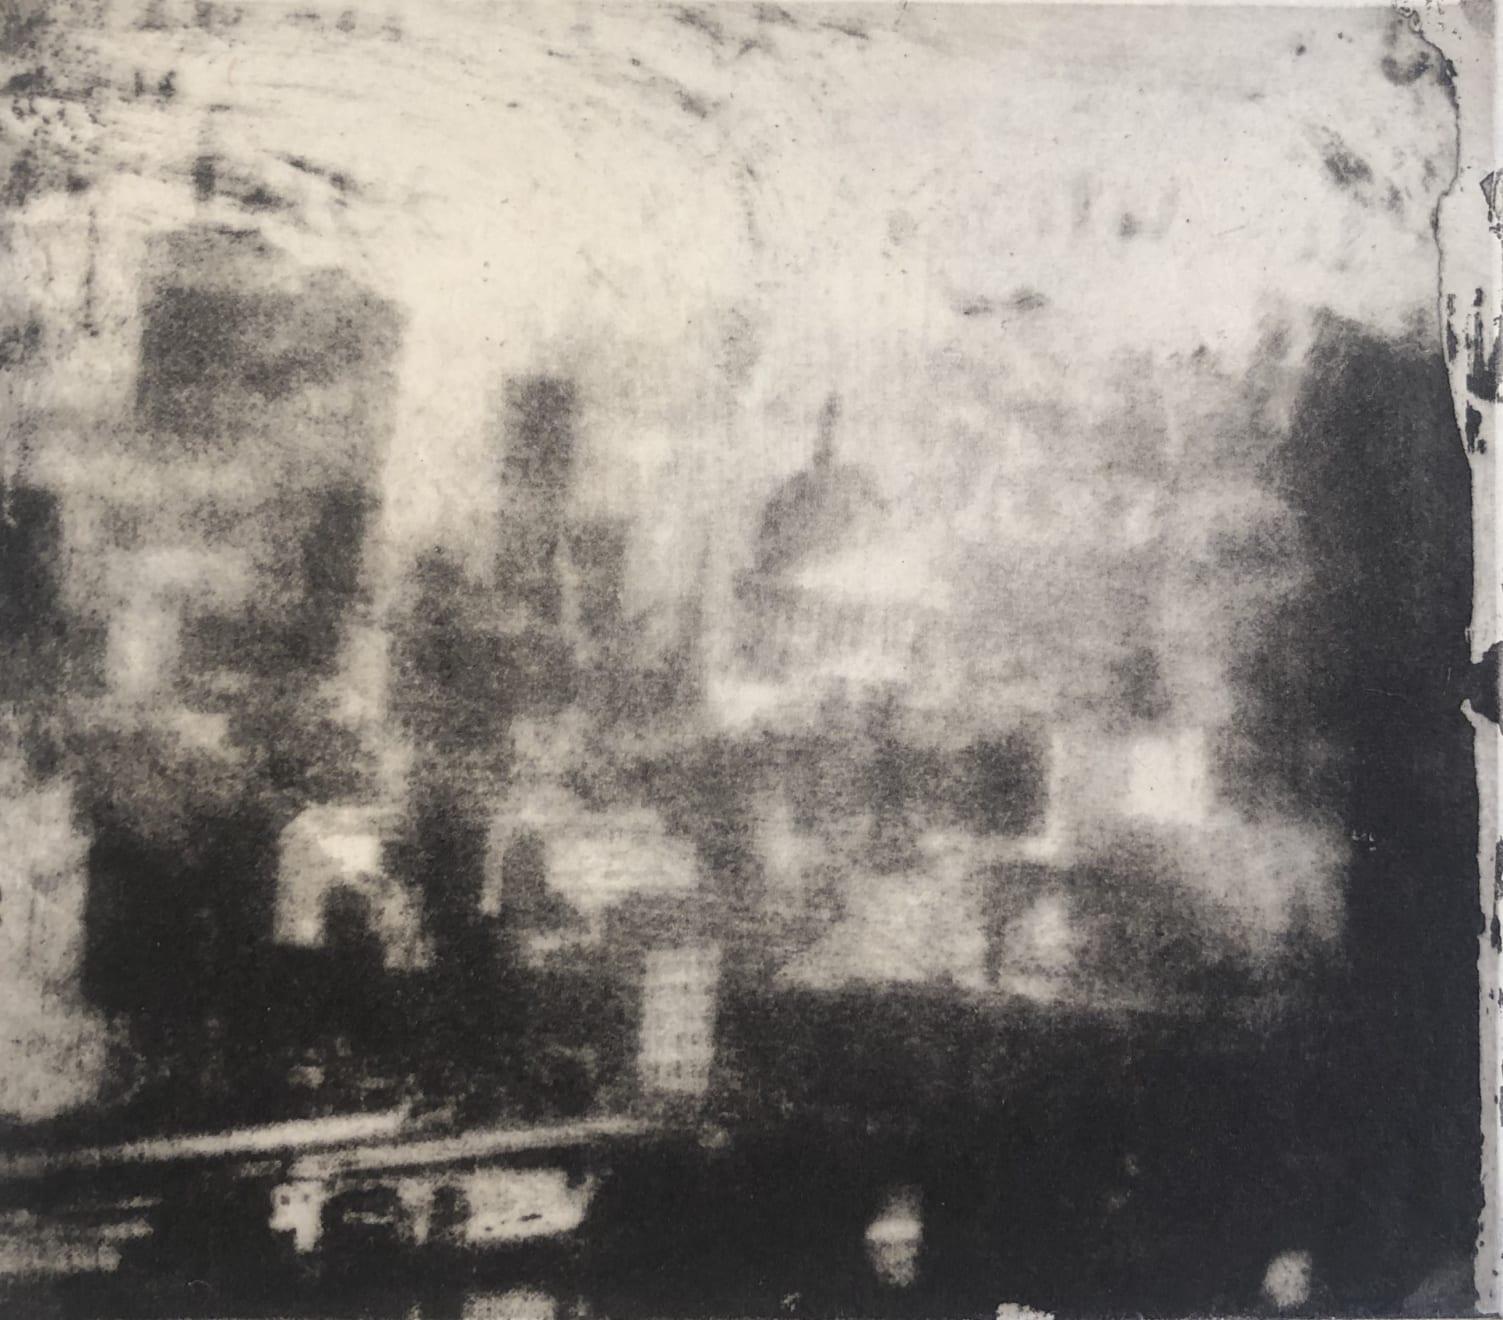 Norman Ackroyd, London, 1973